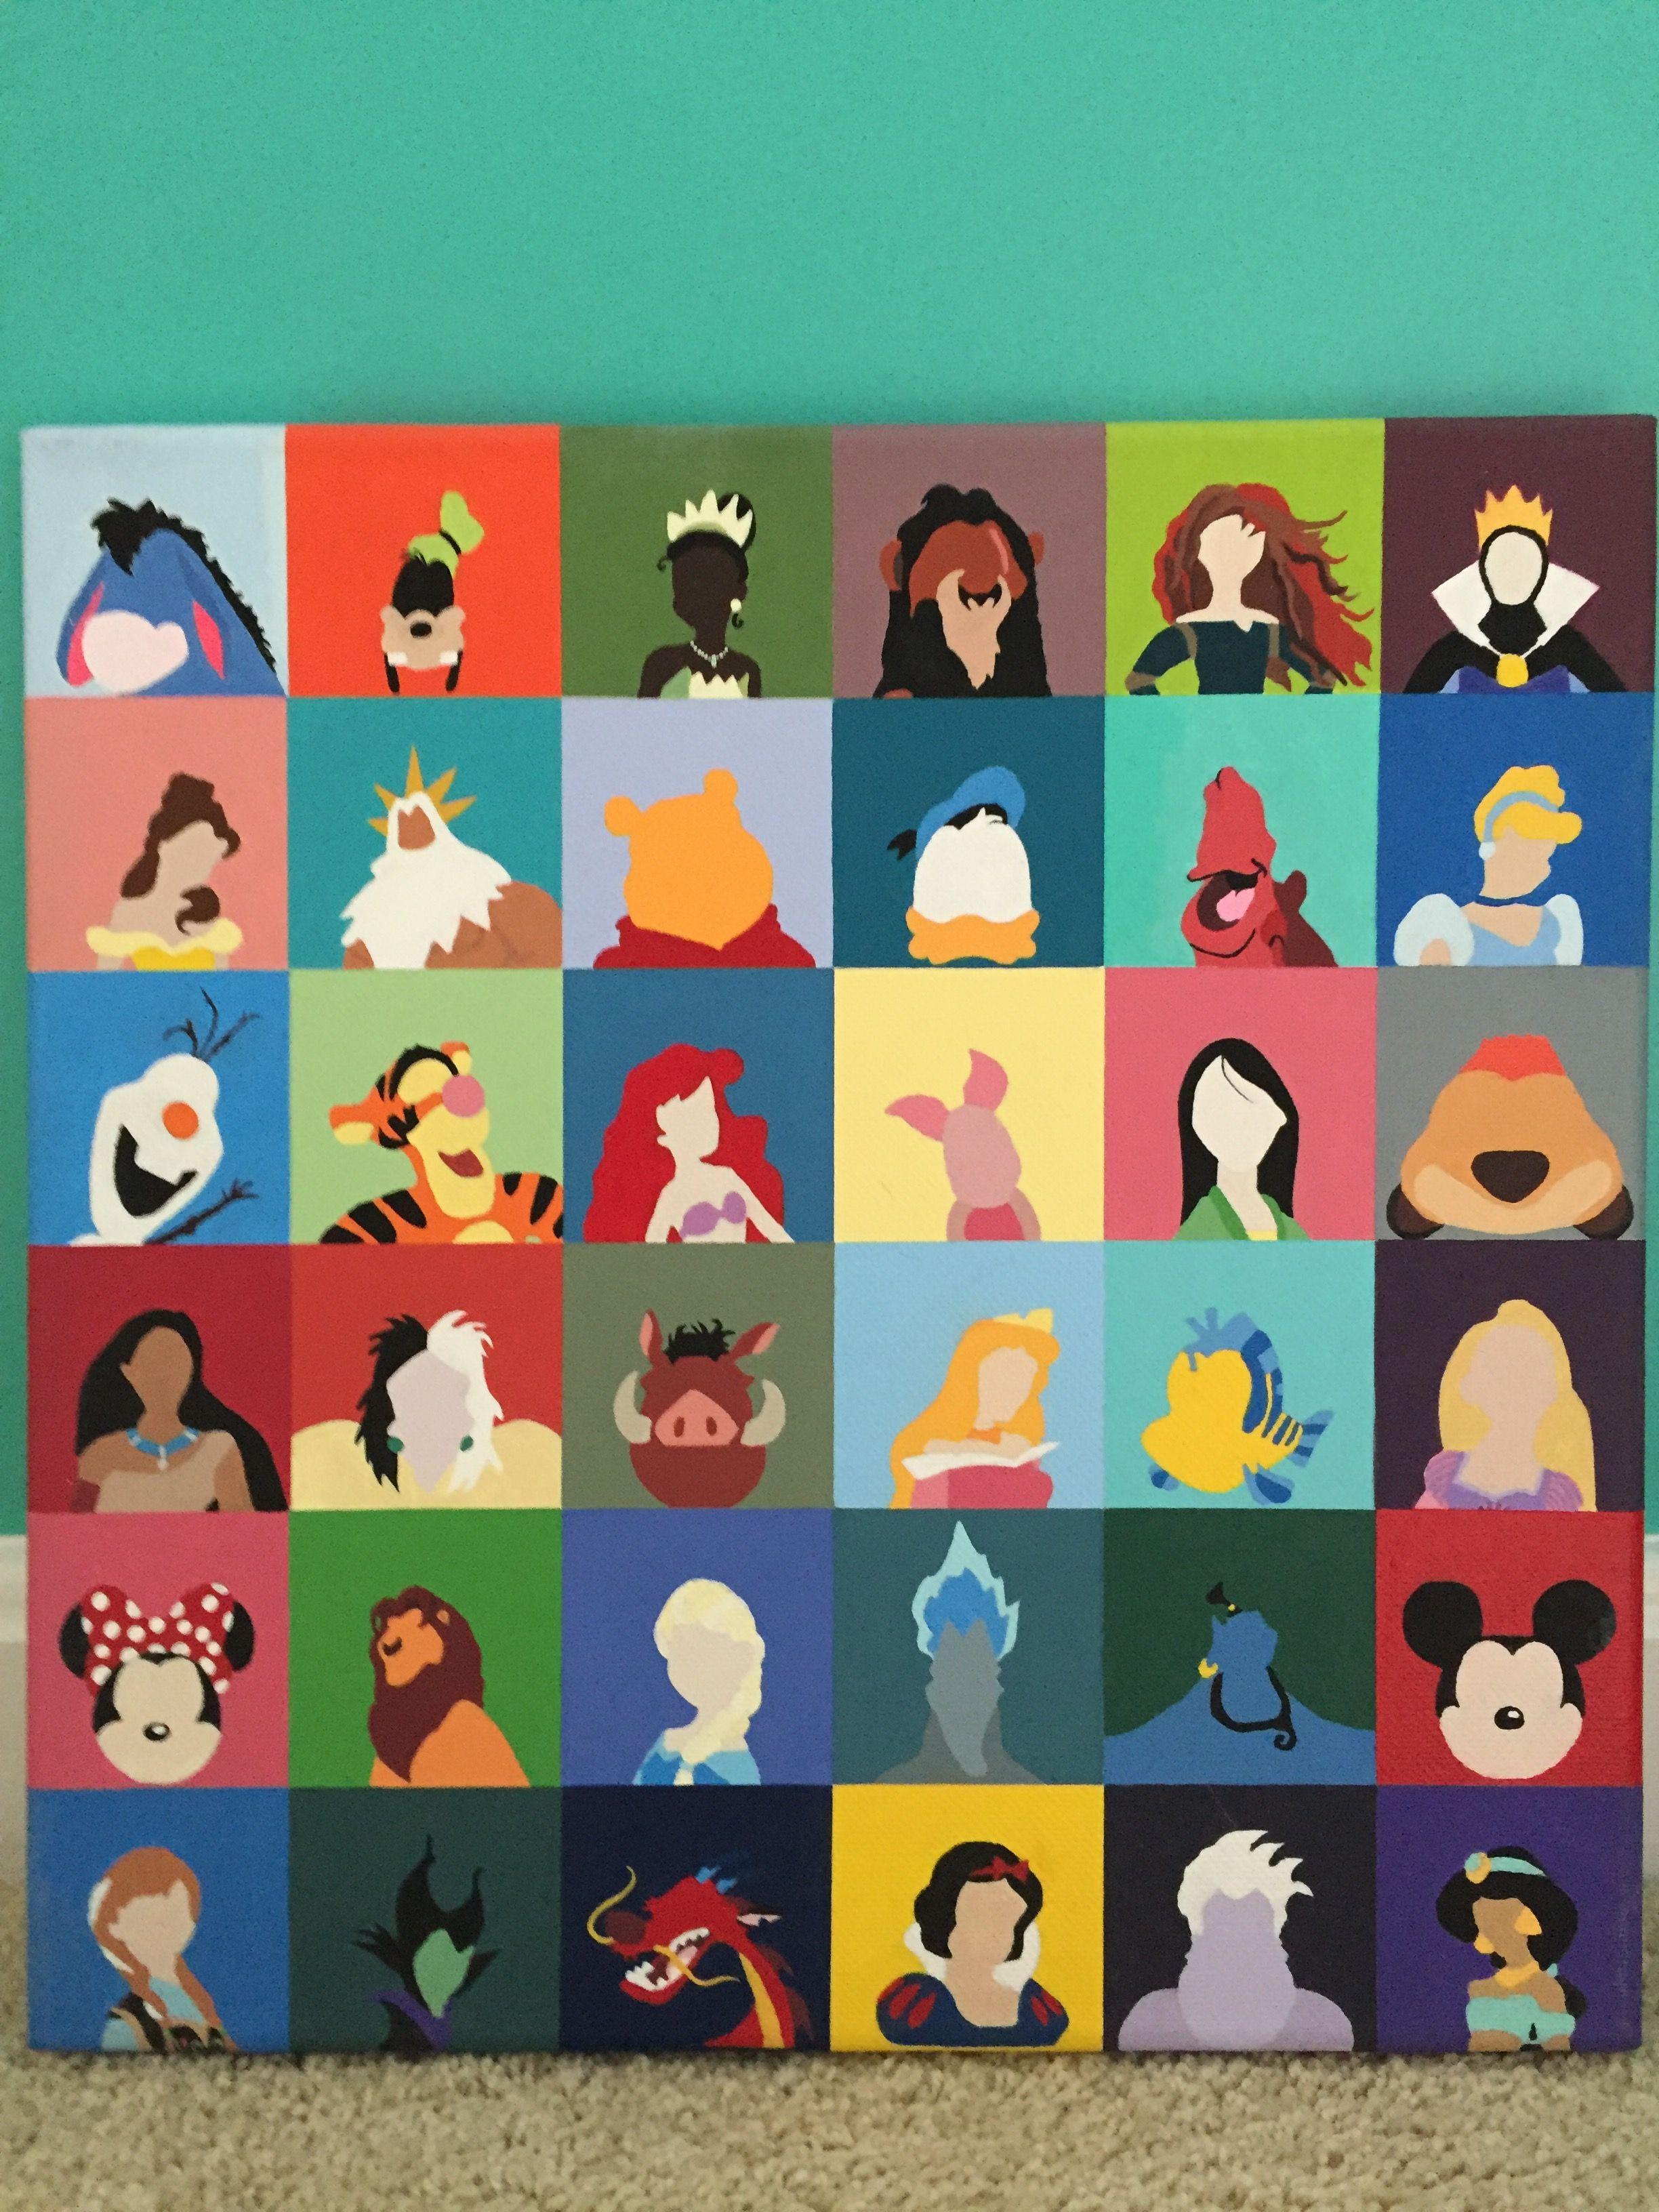 Painting Disney Character Canvas Canvases Eeyore, Goofy, Tiana, Scar, Merida,